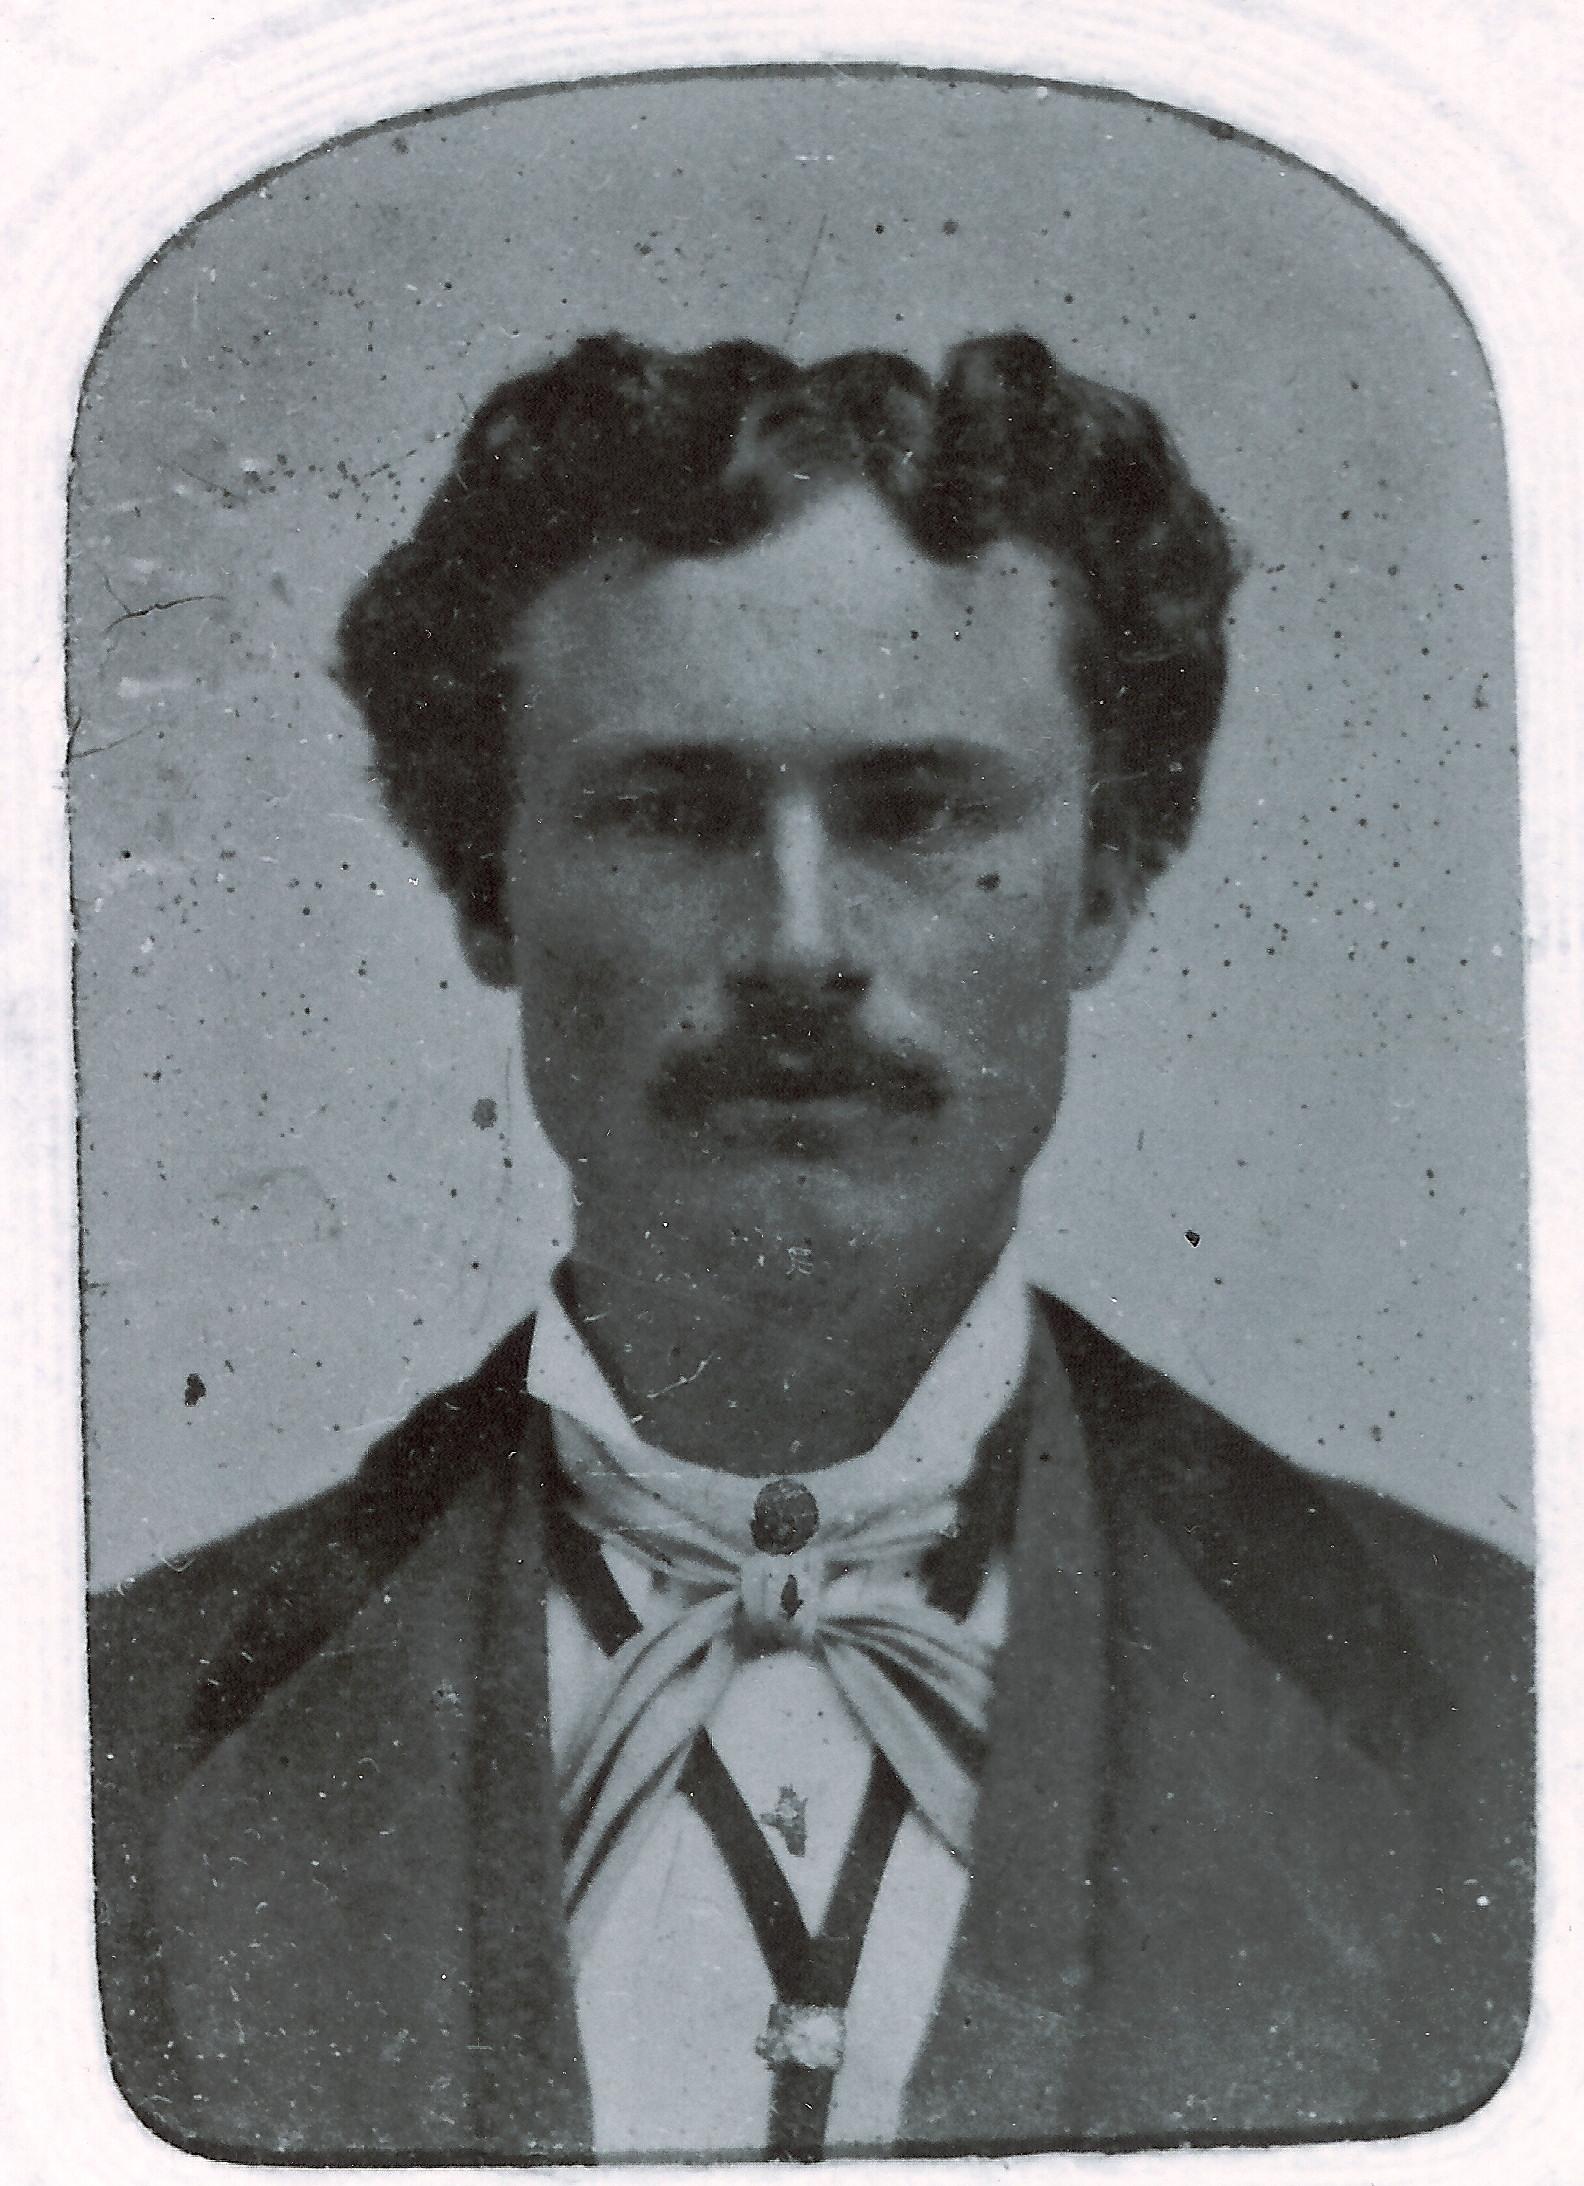 Samuel Franklin Tipton